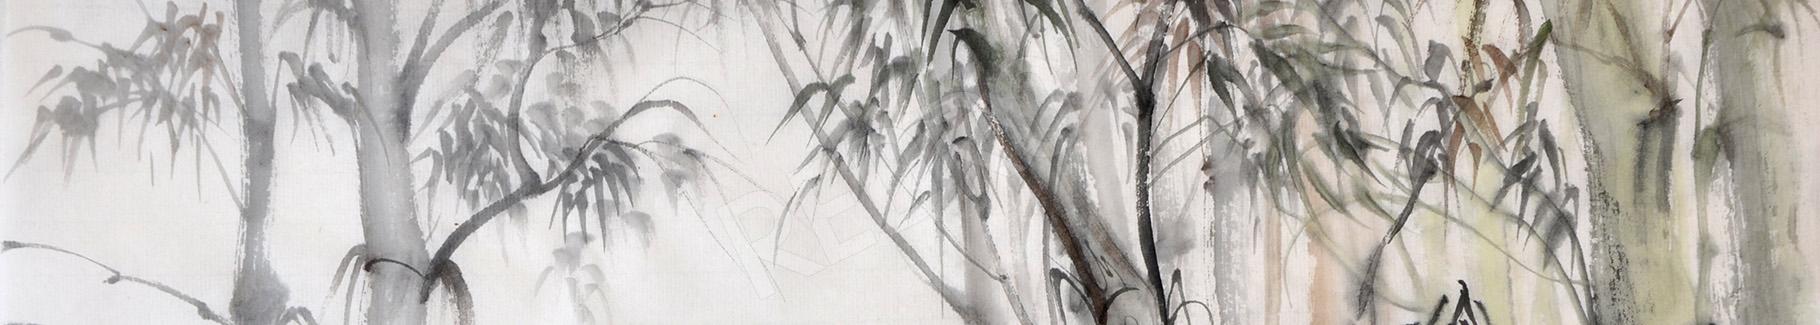 Obraz bambus malowany akwarelą